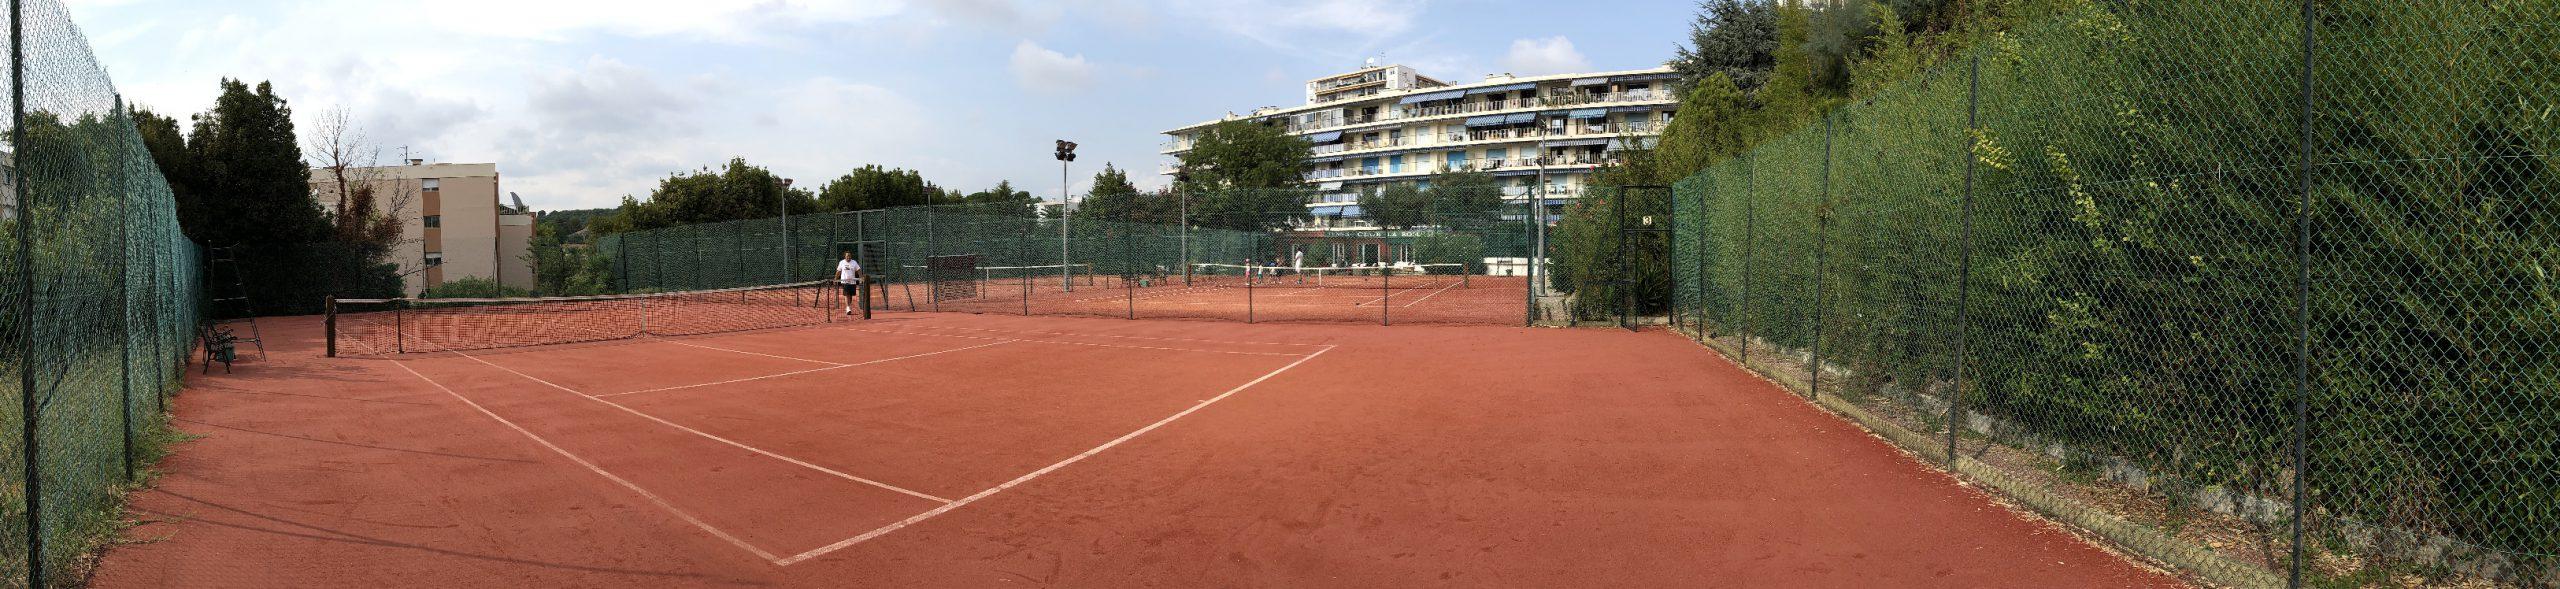 Court tennis club La Roseraie